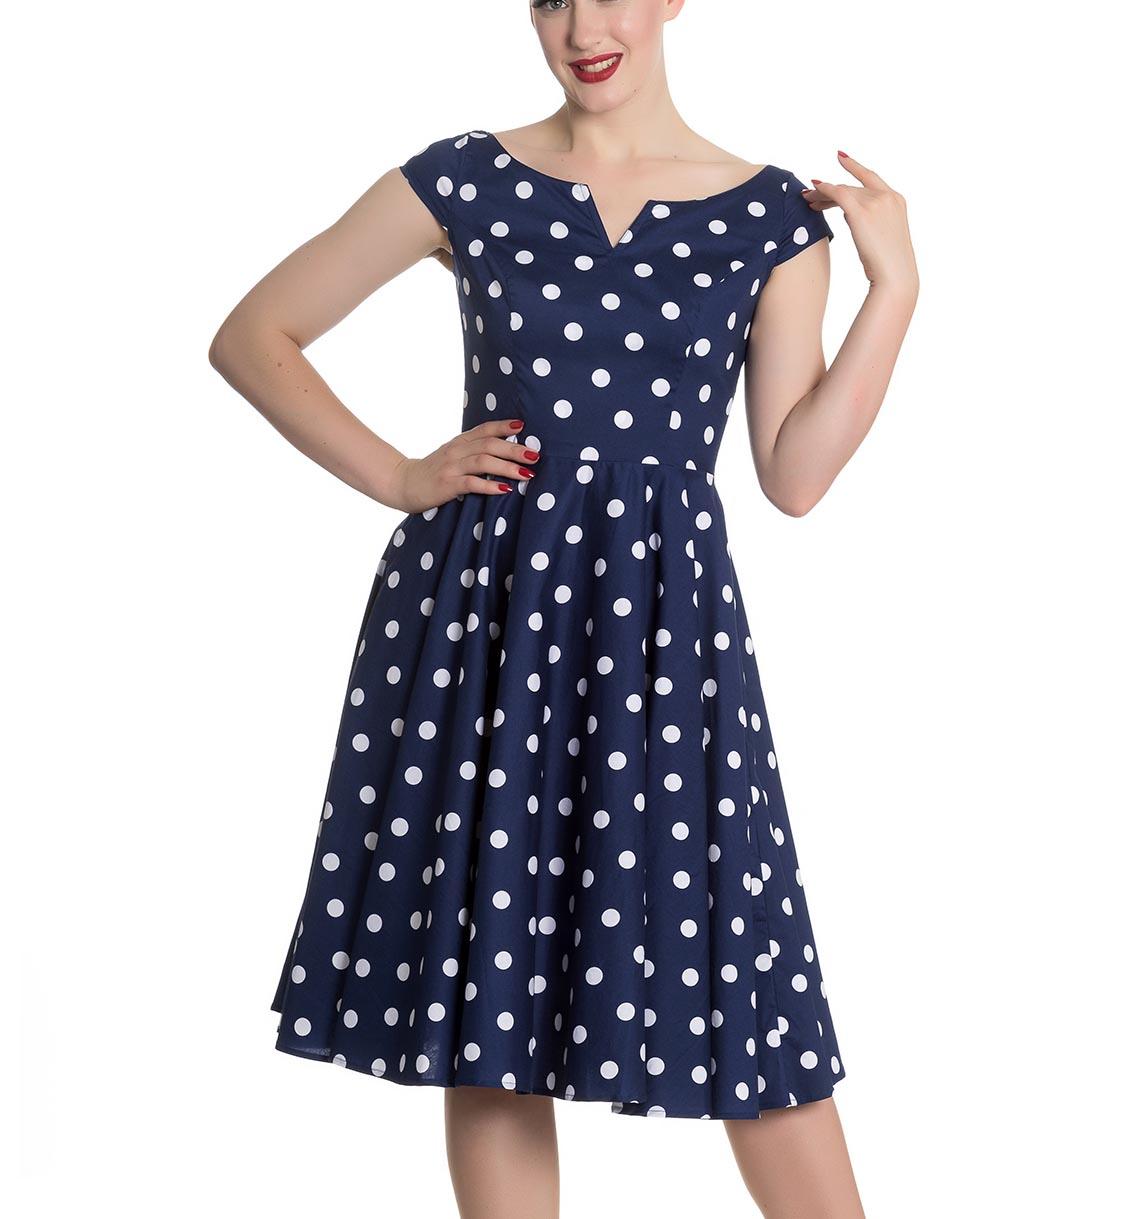 Hell-Bunny-50s-Dress-Polka-Dot-NICKY-Pin-Up-Rockabilly-Navy-Blue-All-Sizes thumbnail 5